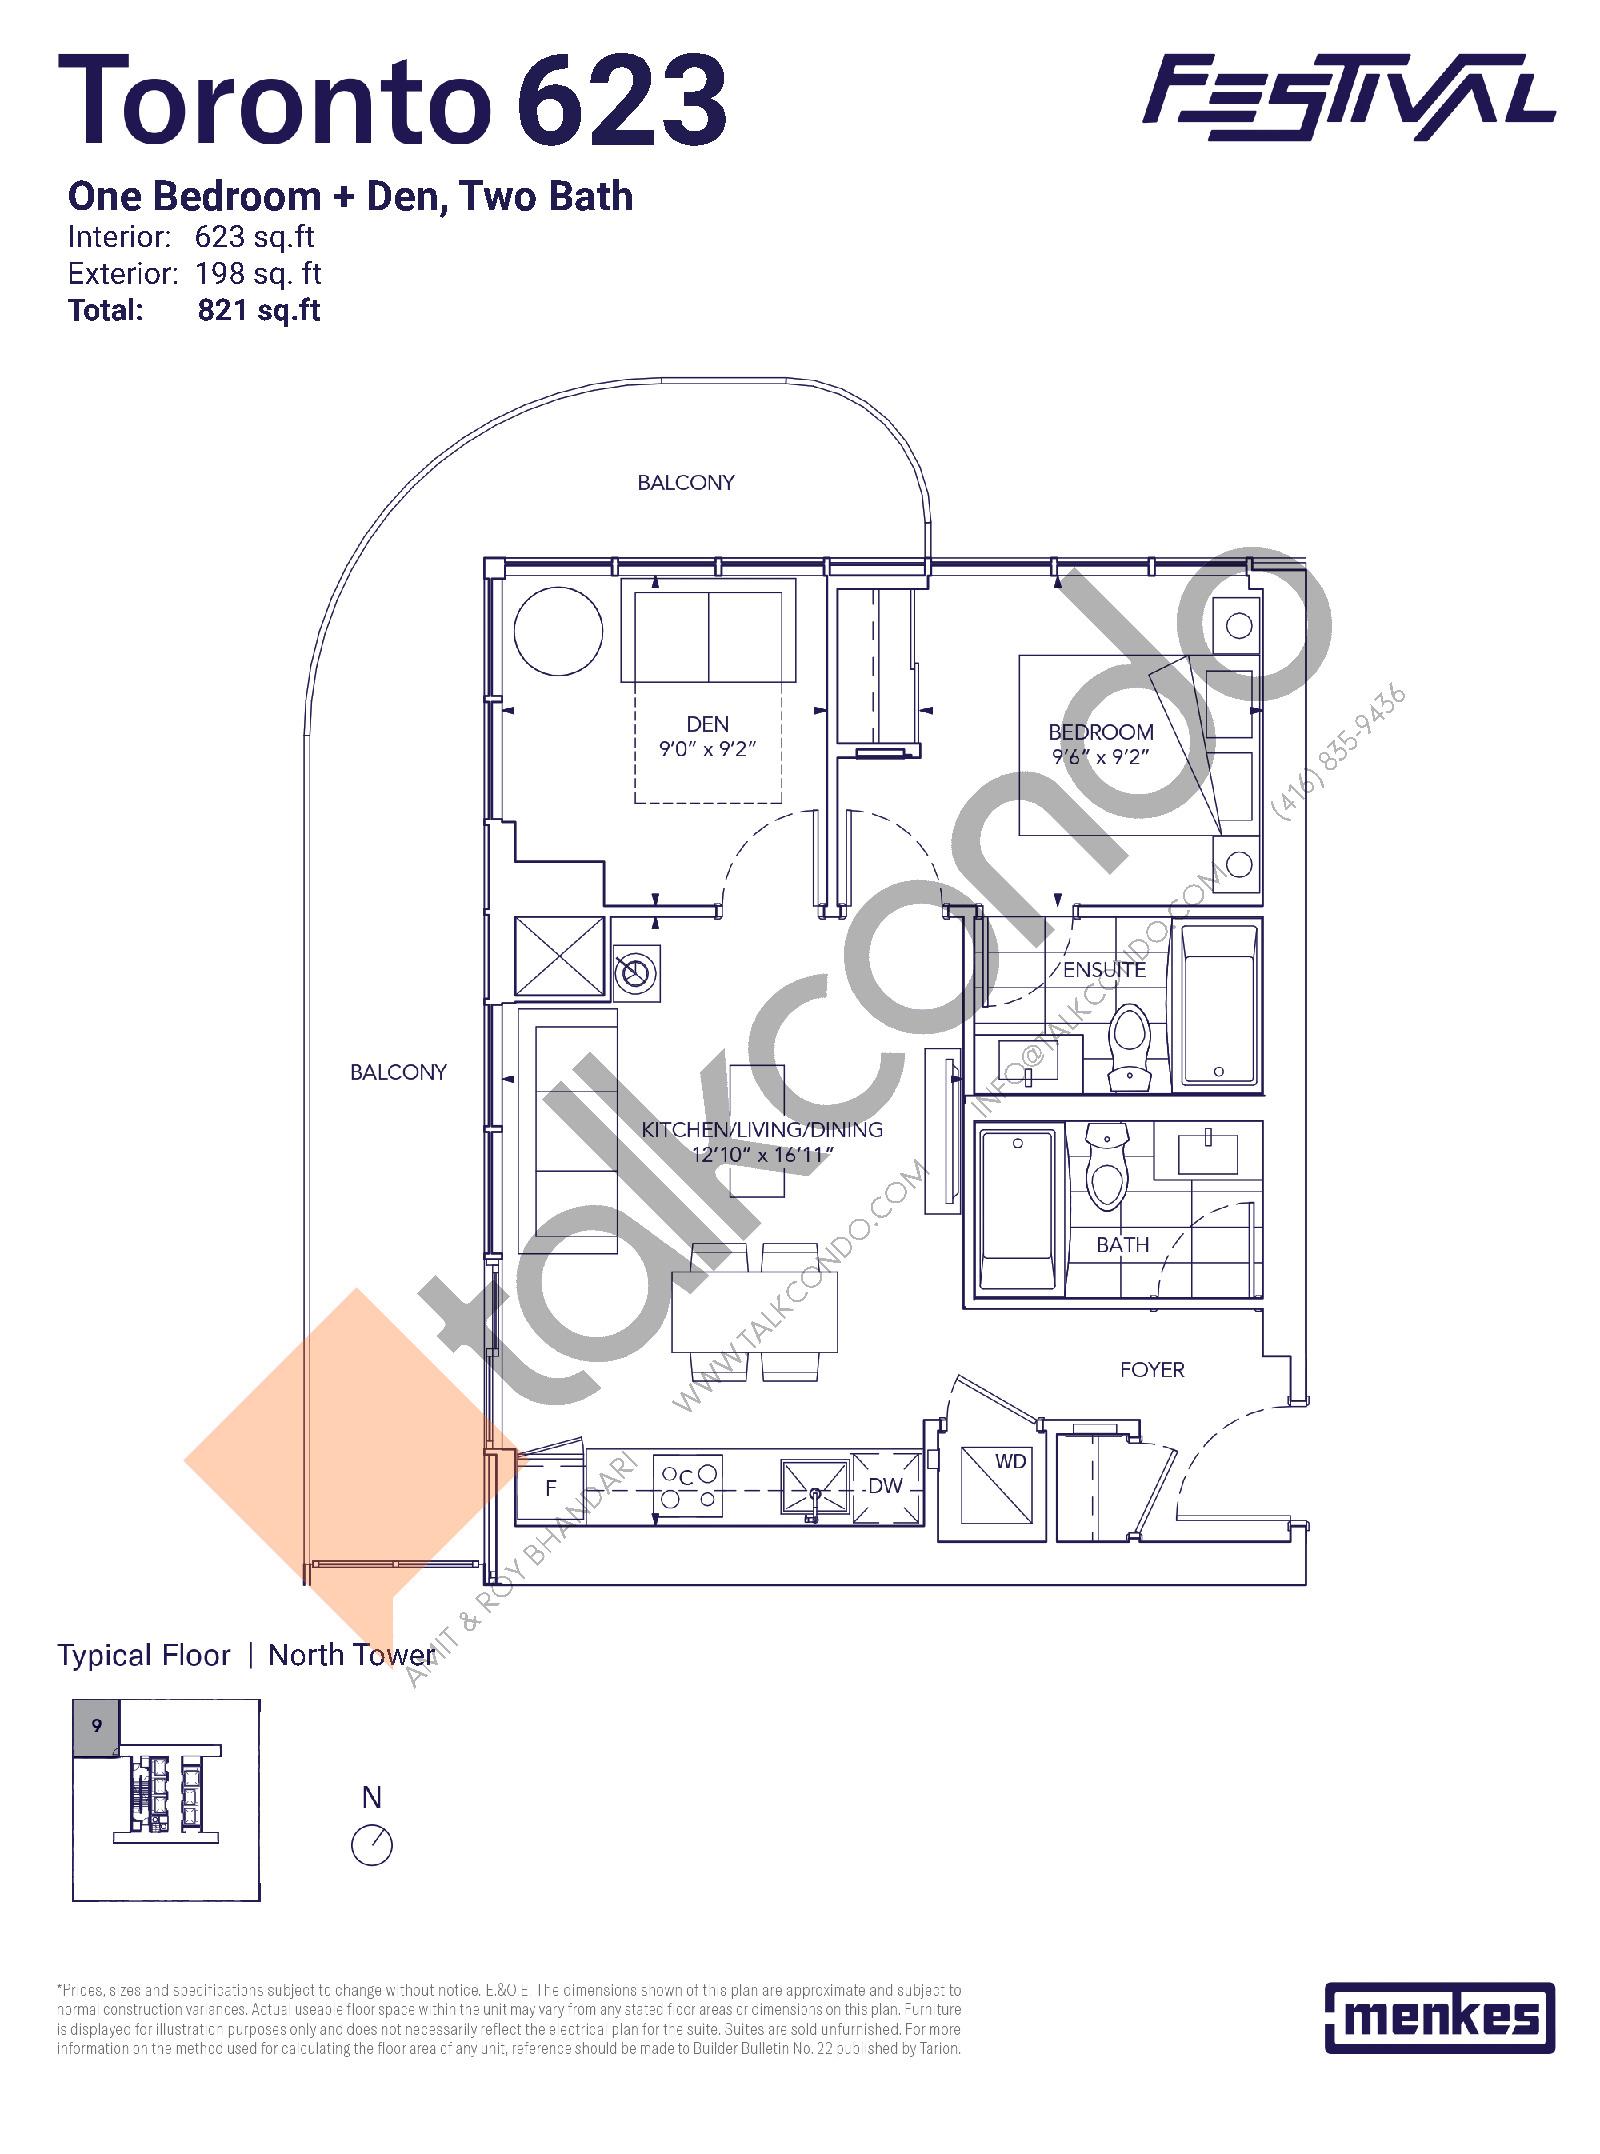 Toronto 623 Floor Plan at Festival Condos North Tower - 623 sq.ft